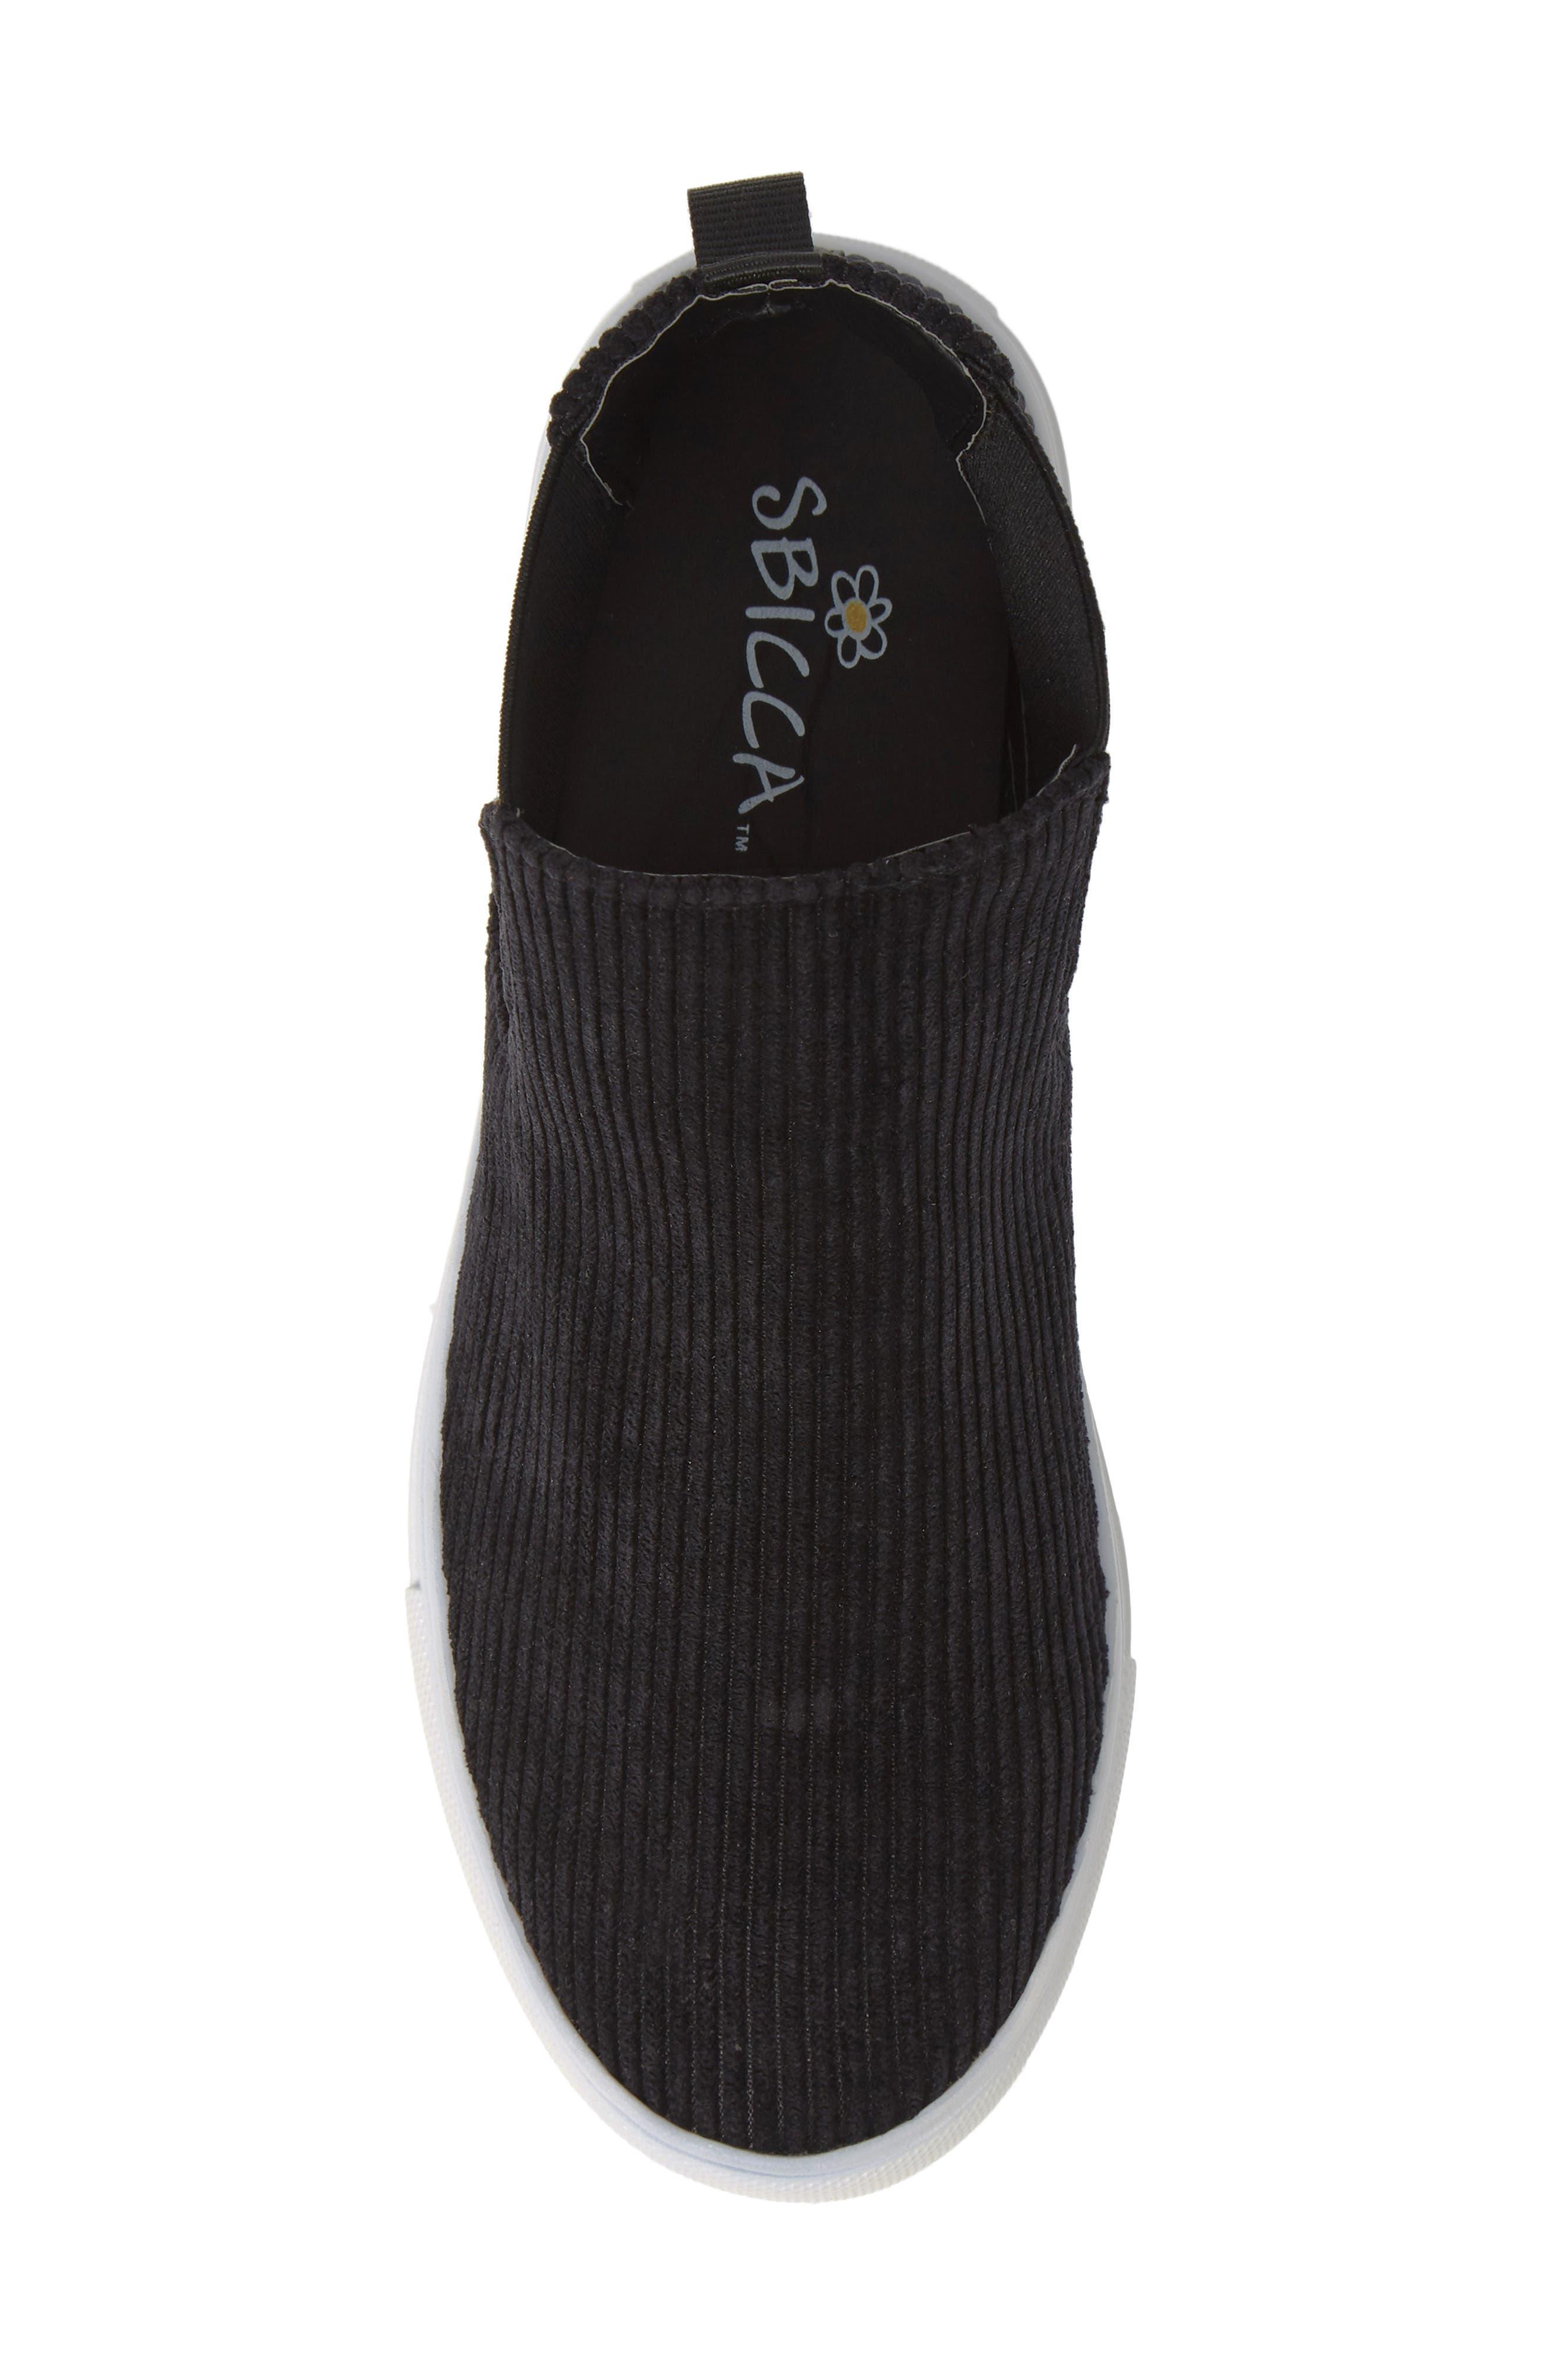 Stratford High Top Sneaker,                             Alternate thumbnail 5, color,                             BLACK FABRIC